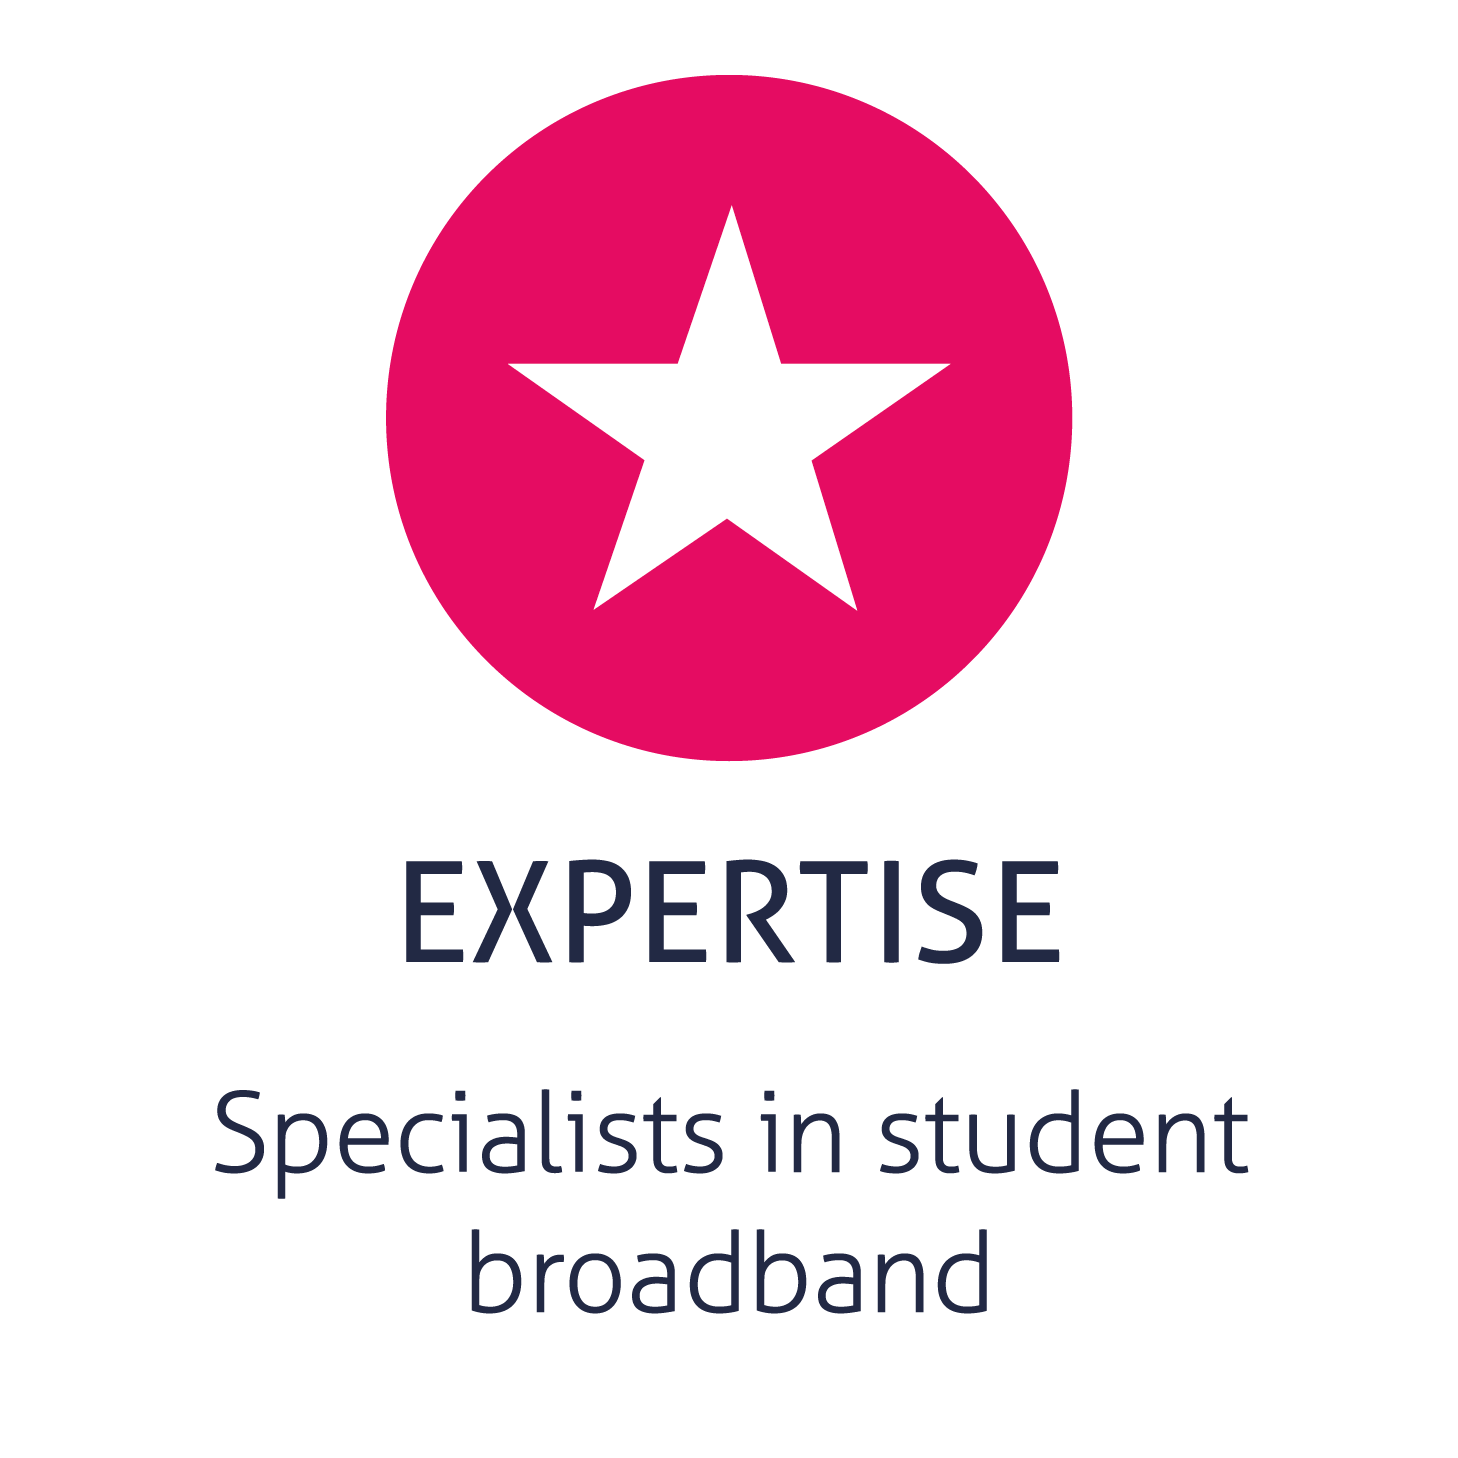 Specialists in student broadband